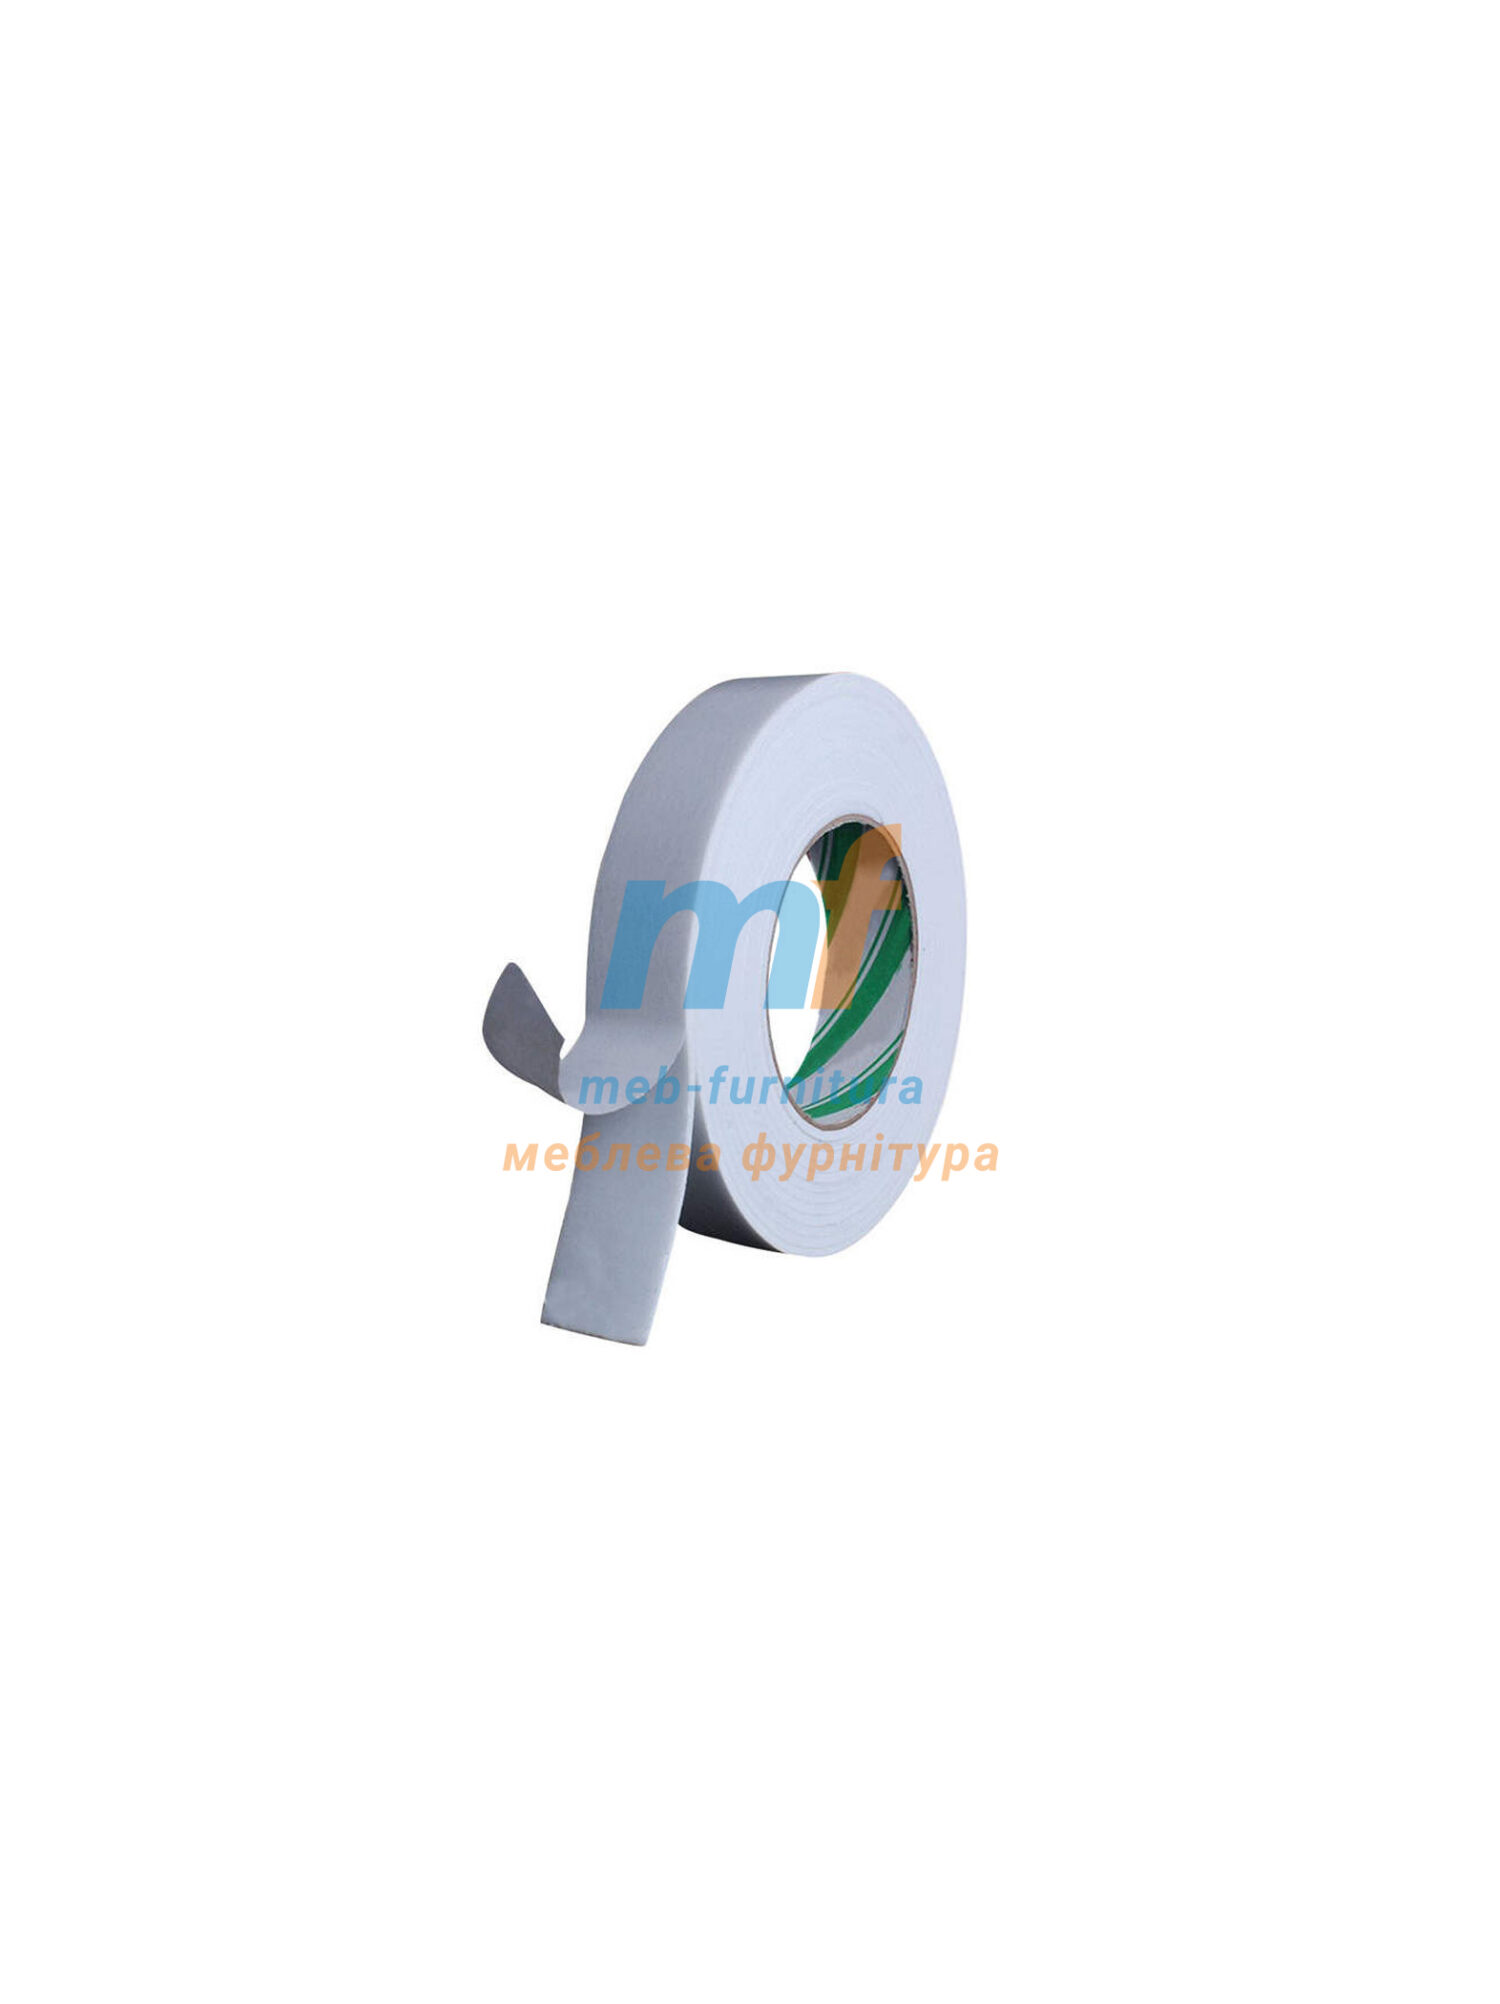 Двухсторонний скотч для дзеркал 20ммх5м Белый Турция